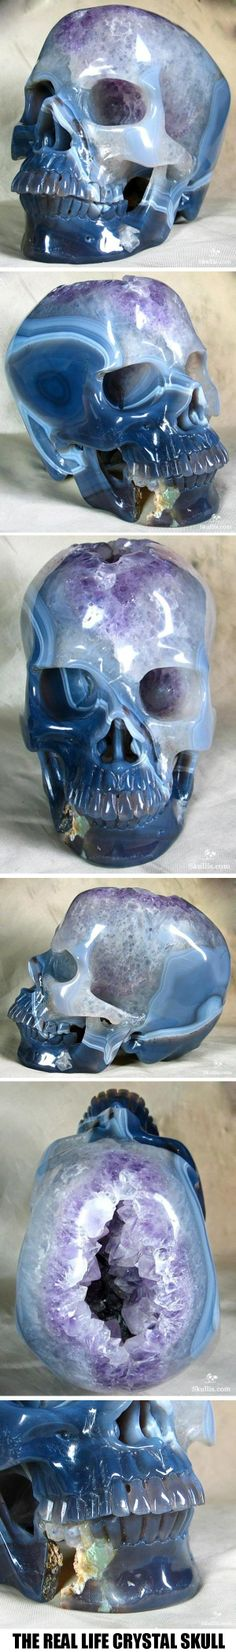 The Real Life Crystal Skull!